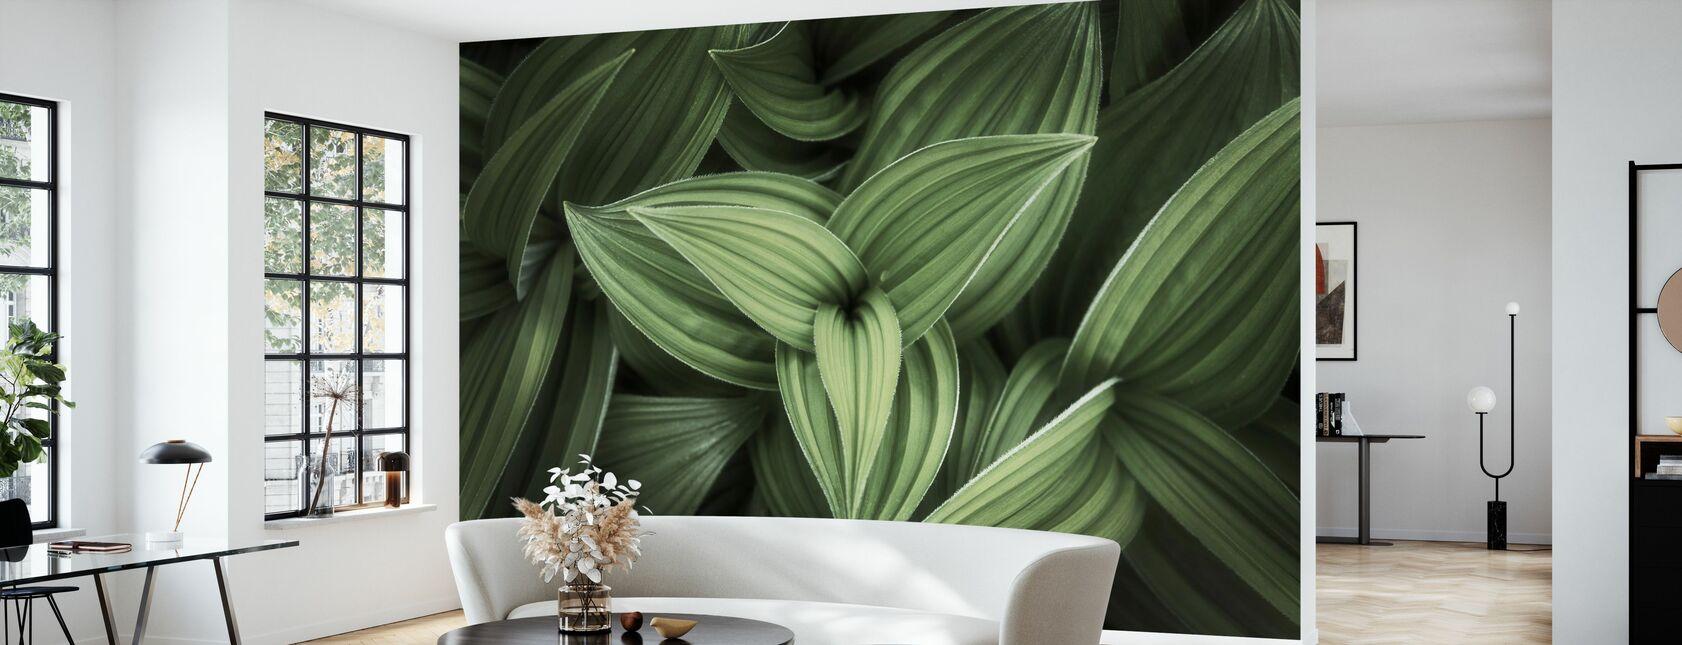 Corn Lily - Wallpaper - Living Room